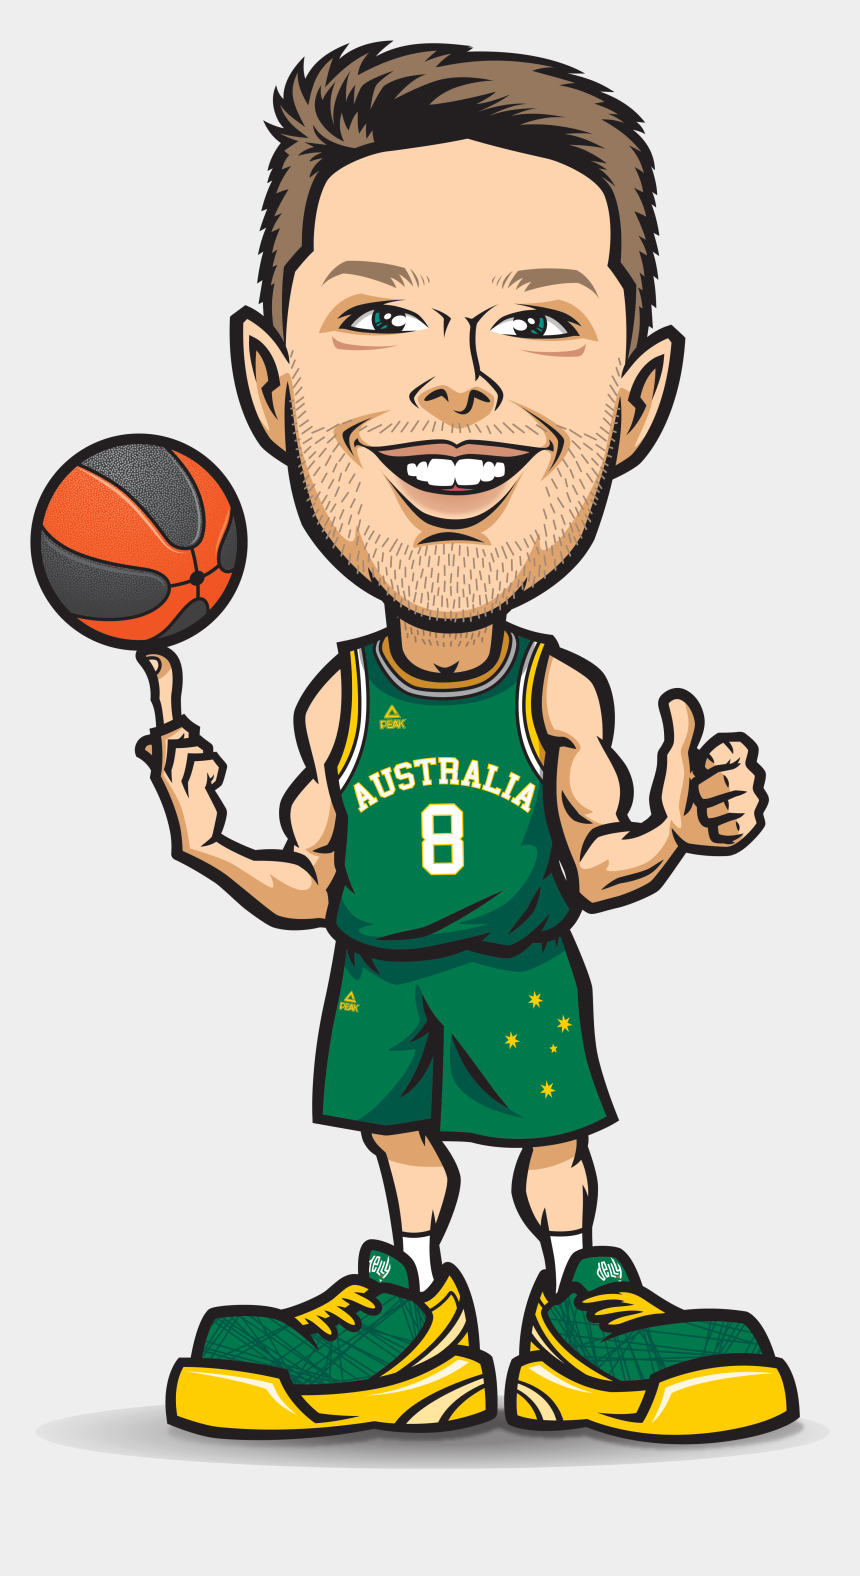 basketball hoop clipart black and white, Cartoons - Ba Matthewdellavedova Final - Basketball Player Cartoon No Ball